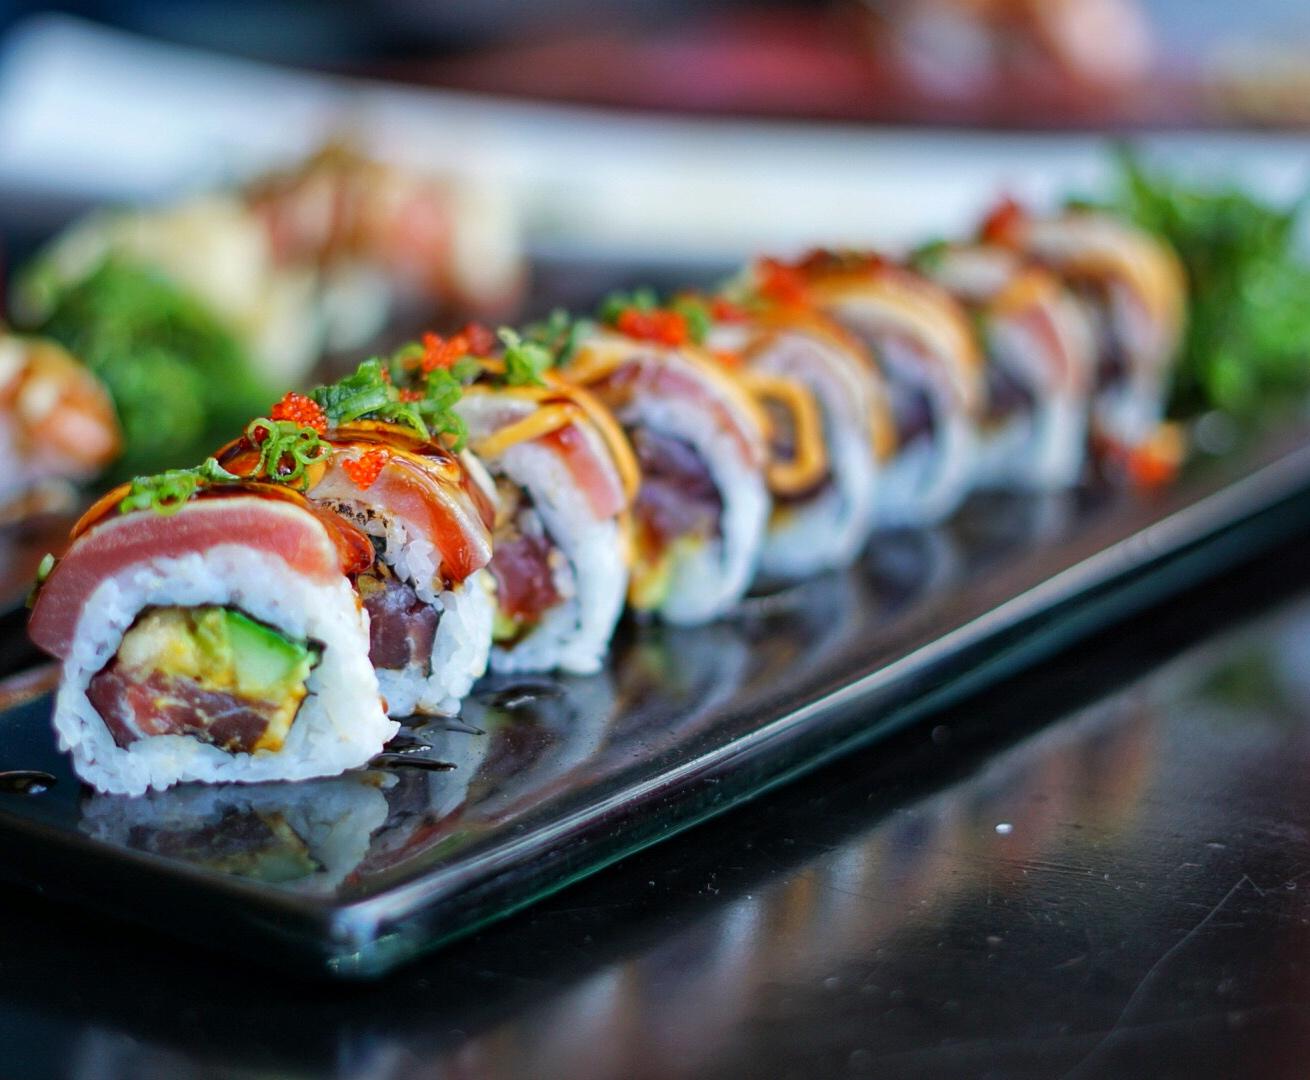 Spicy Tuna Tataki: Ahi tuna poke, Haas avocado, cucumber, homemade spicy sauce, soy BBQ sauce, orange tobiko & tempura flakes.